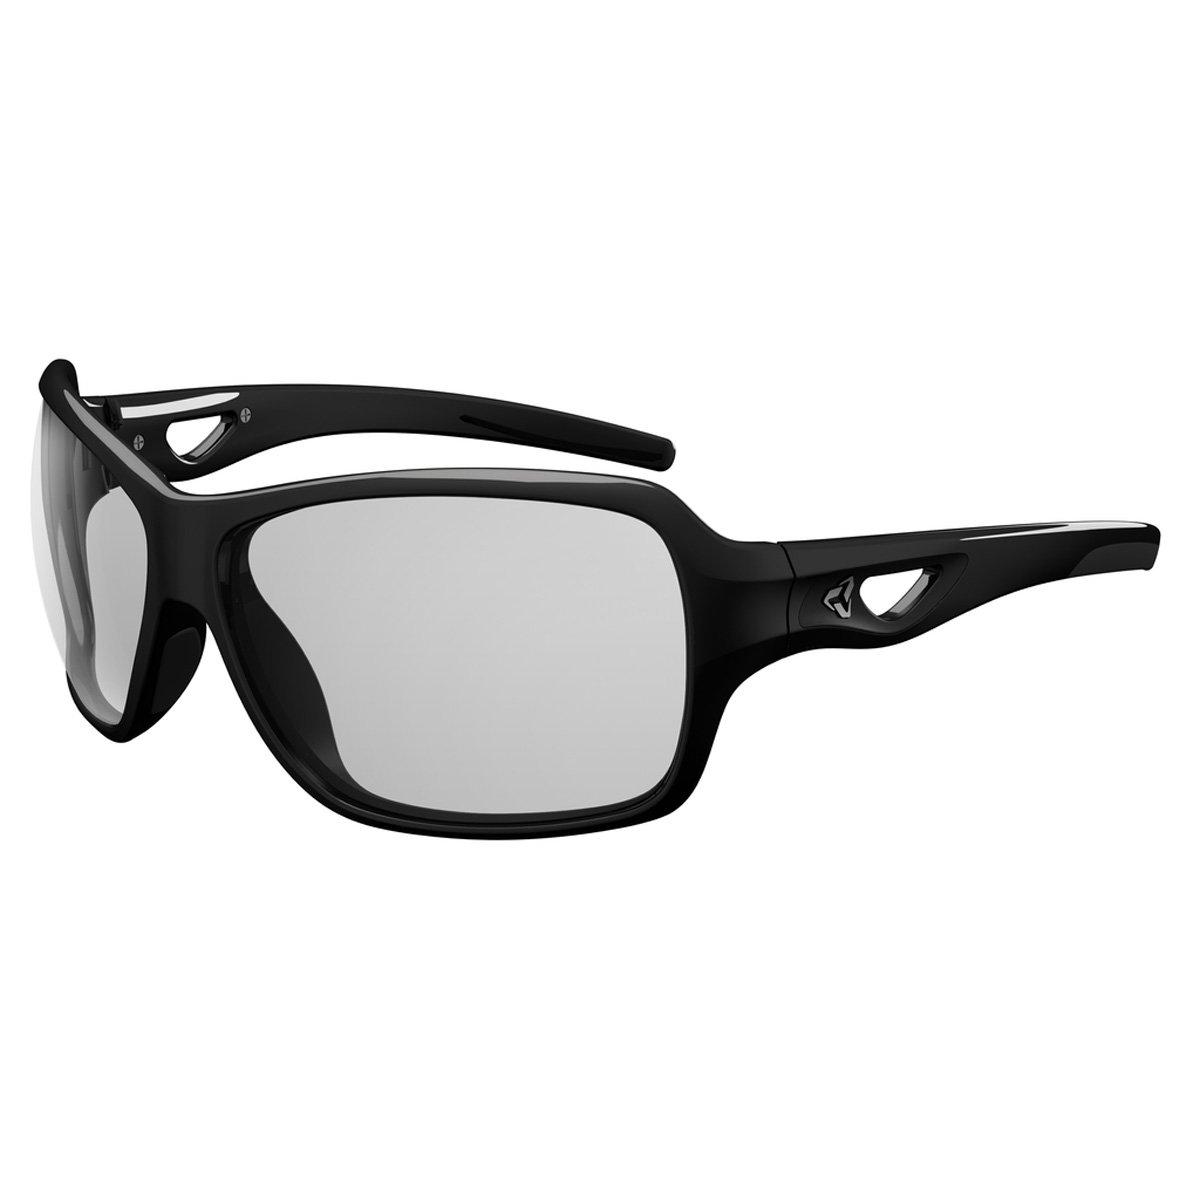 Ryders Eyewear Carlita Photochromicサングラス  BLACK / LT GREY LENS 75%-26% B01EJYJG5M